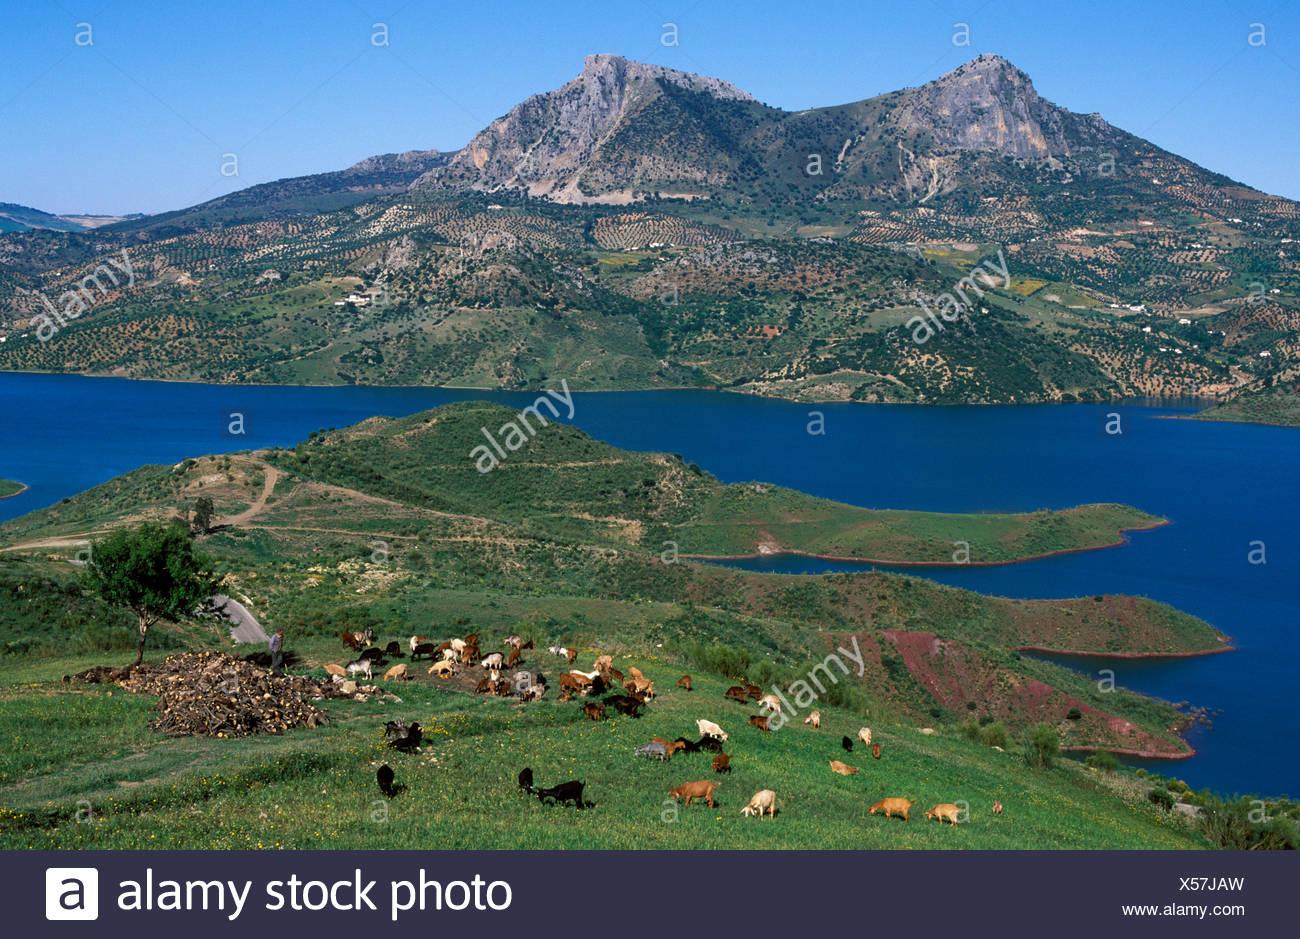 Embalse de Zahara, reservoir in the Sierra de Grazalema, Cádiz Province, Andalusia, Spain Stock Photo